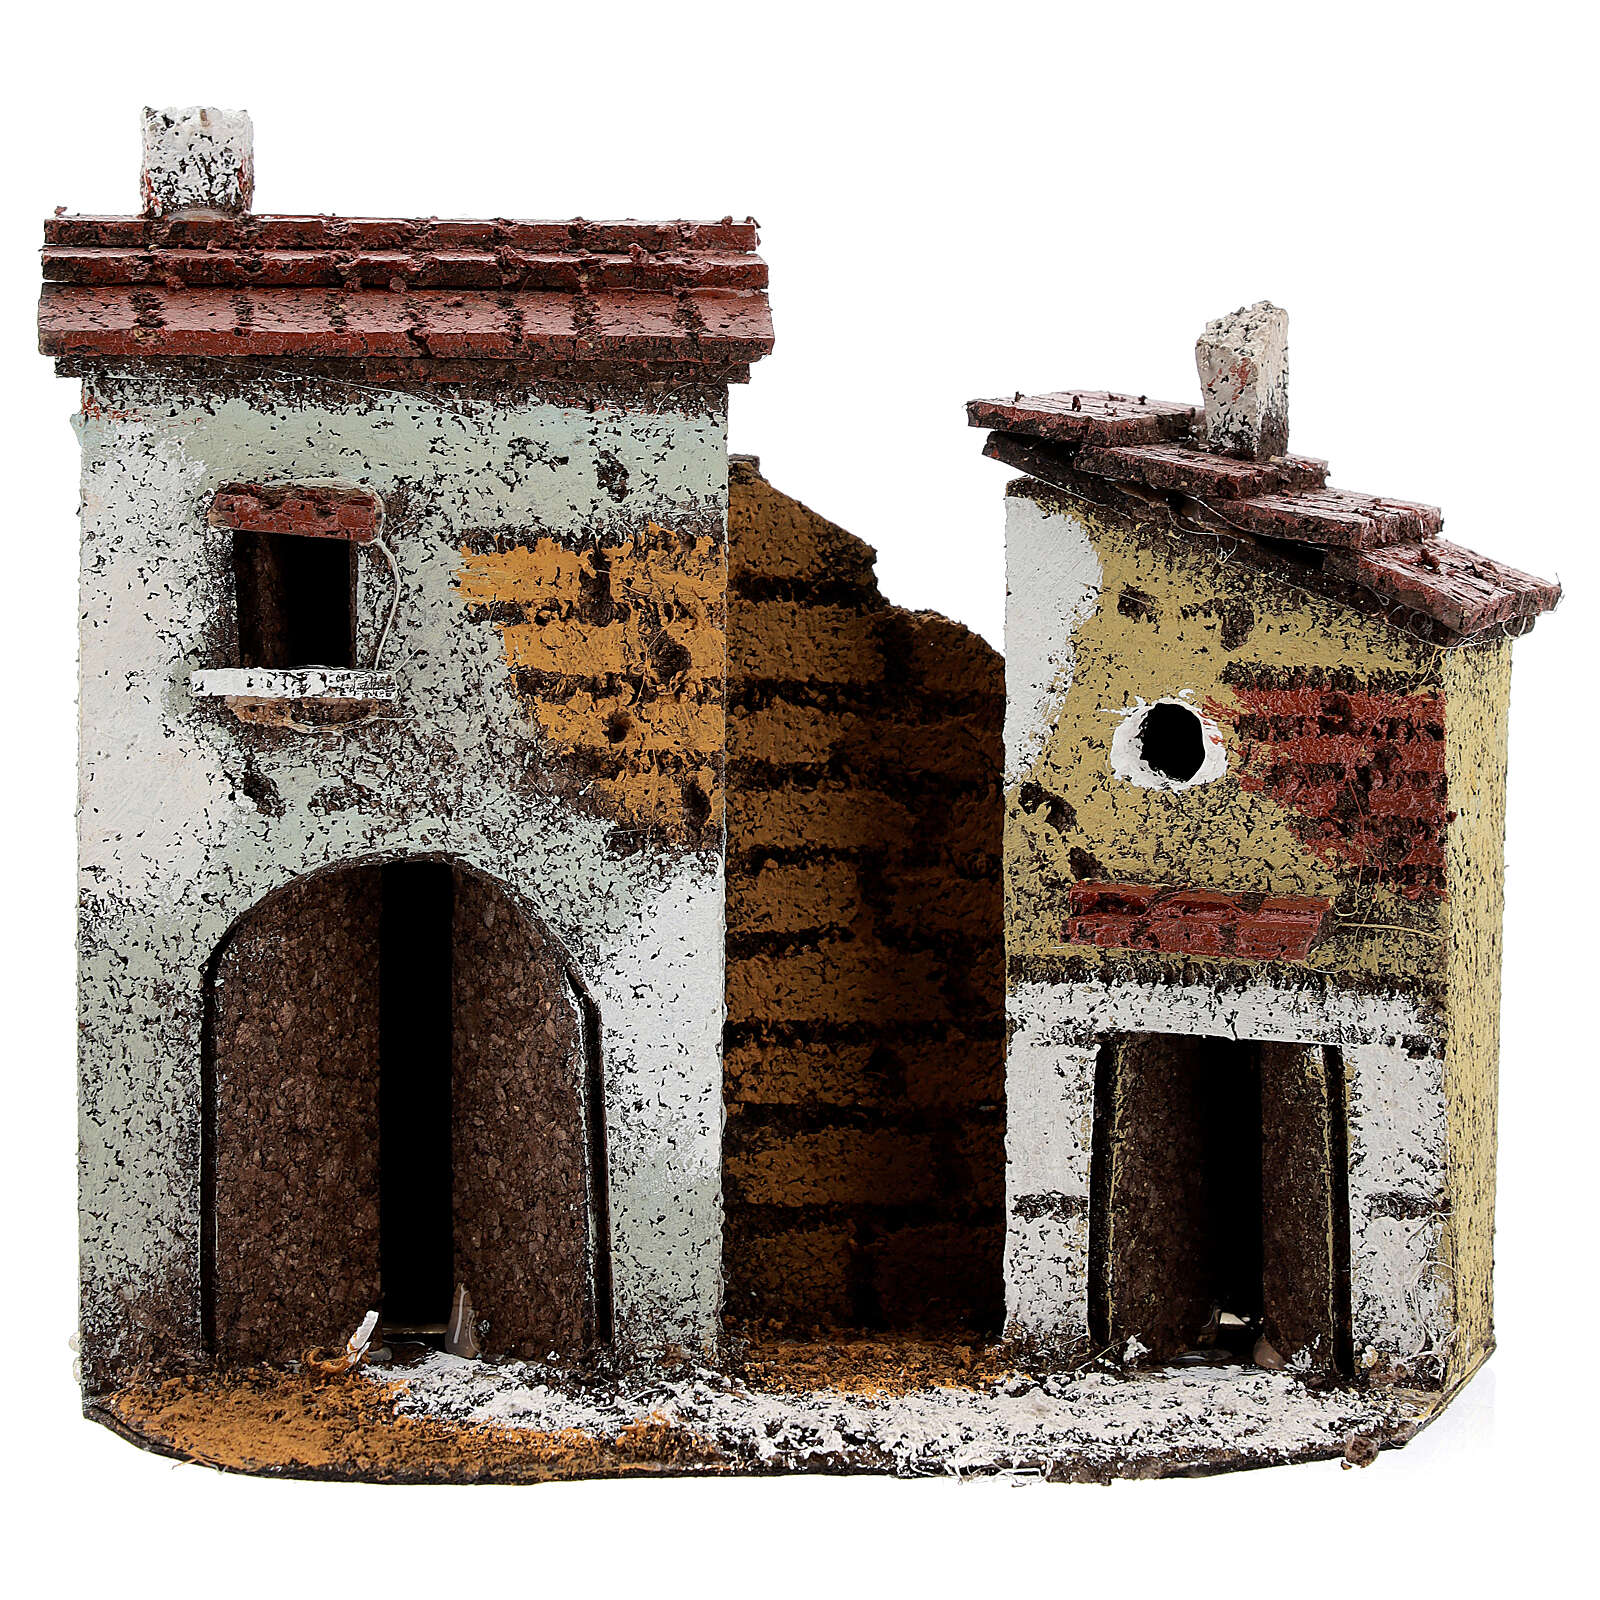 Miniature cork houses Neapolitan Nativity scene 15x15x5 for statues 4 cm 4